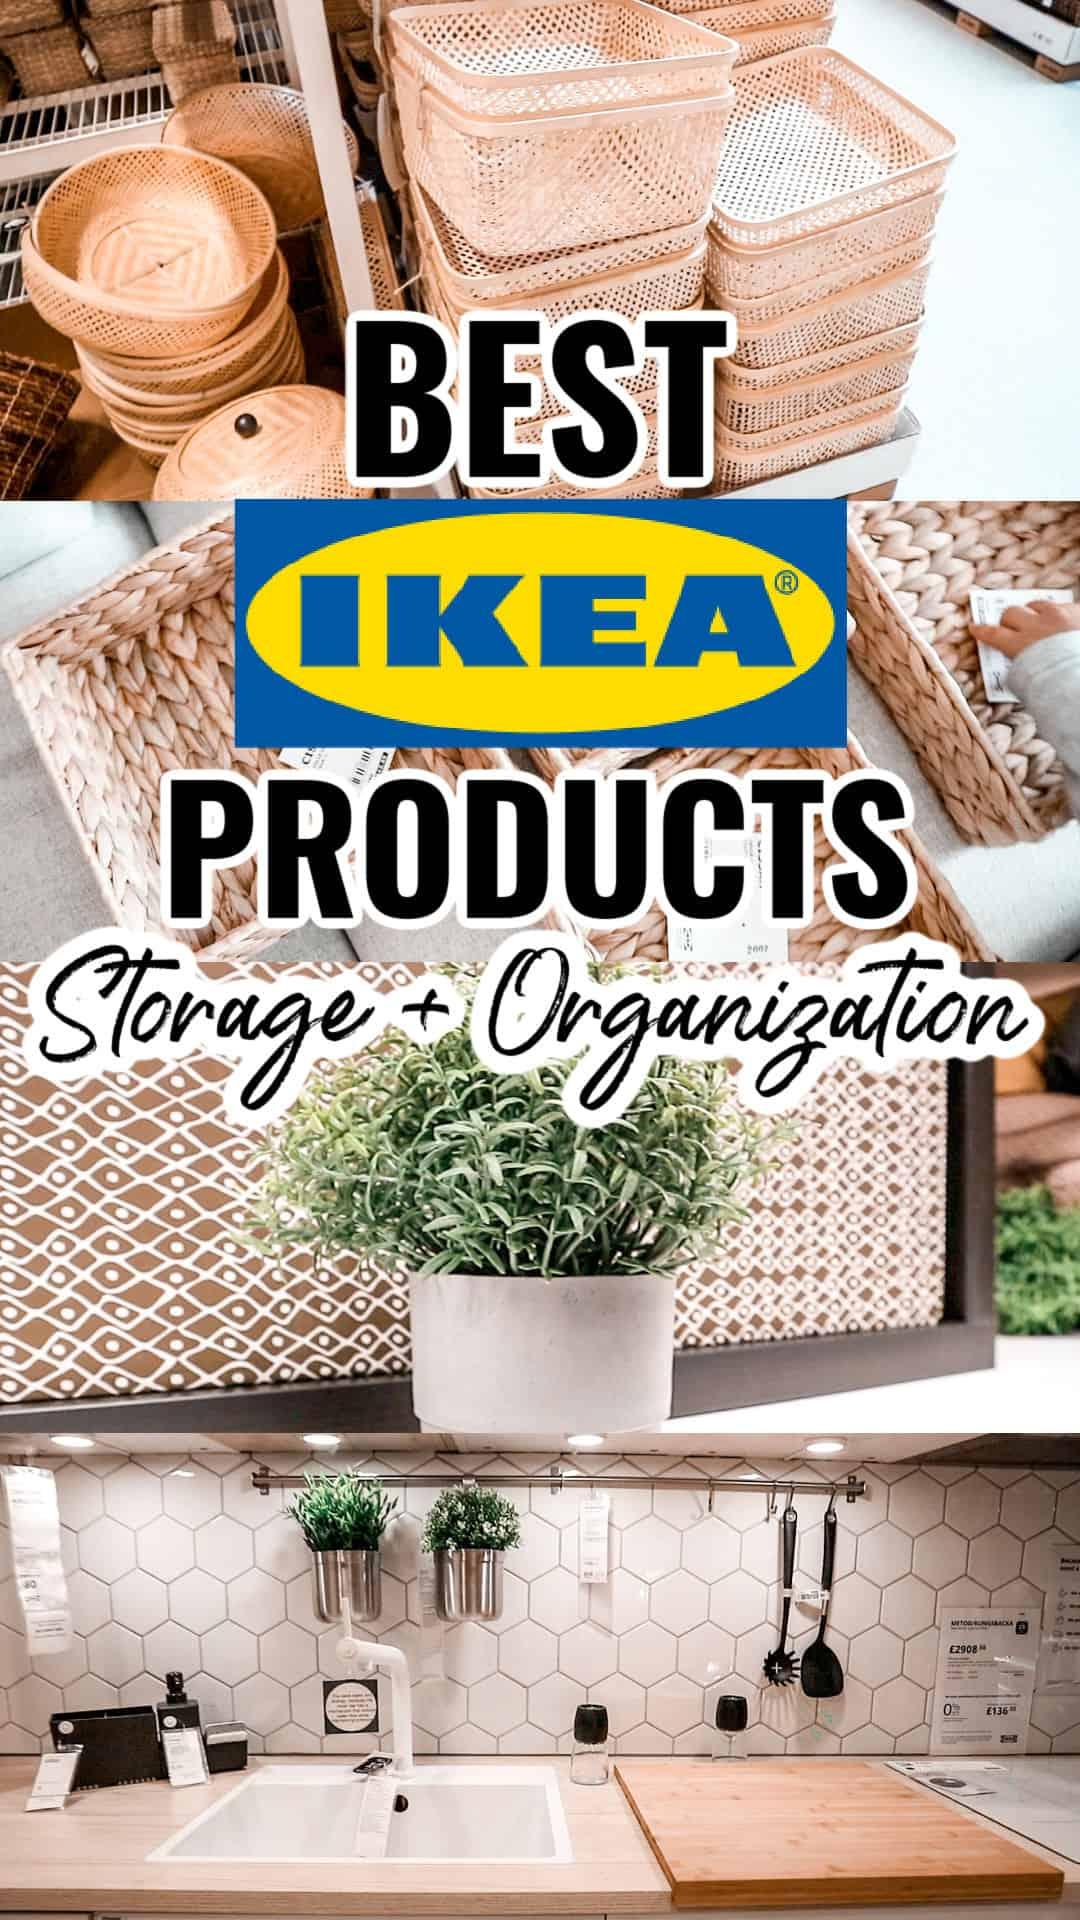 Best IKEA products under 20 storage and organization ideas